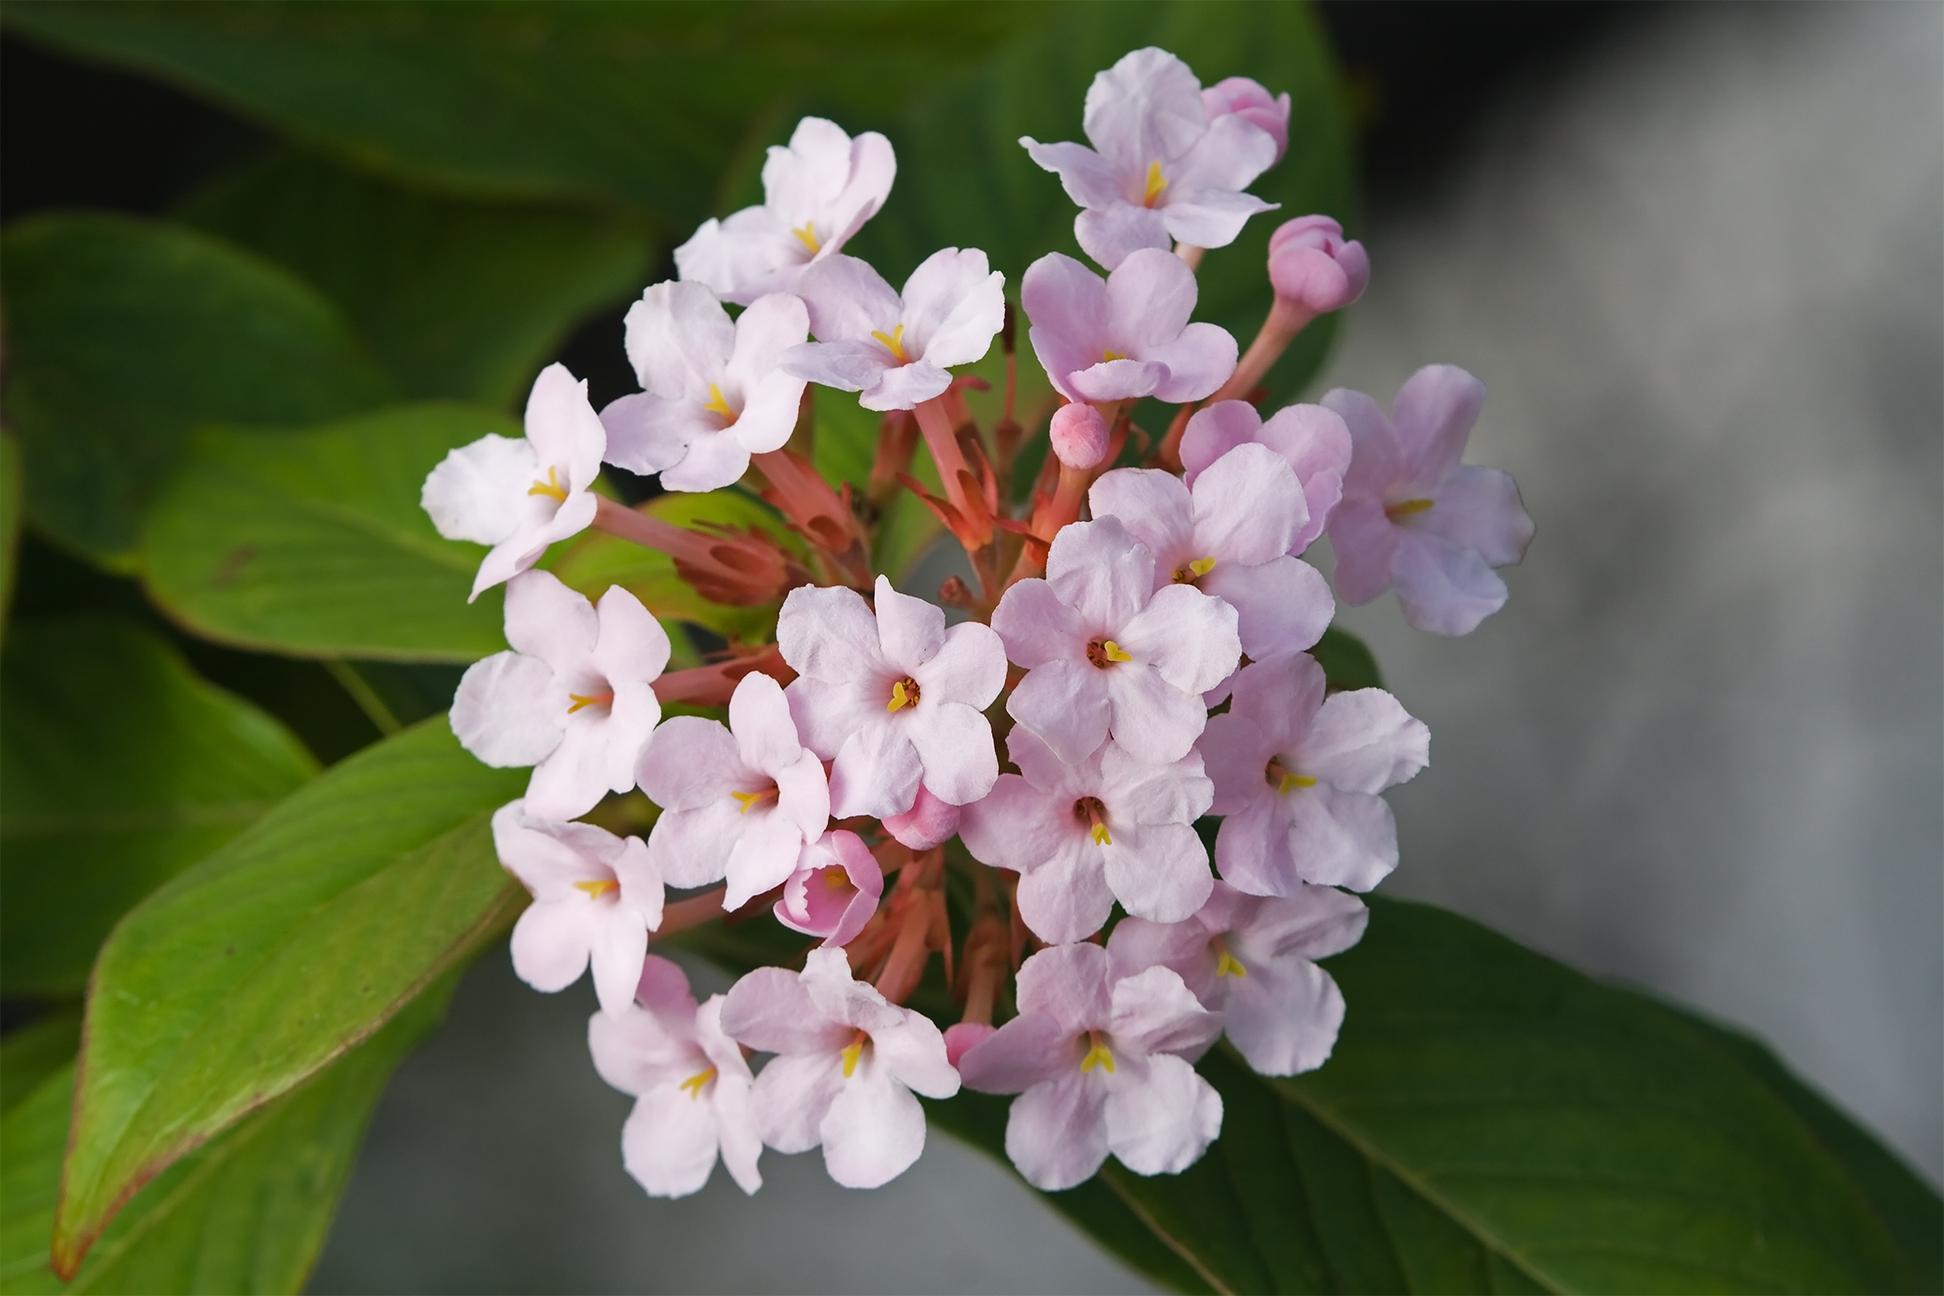 Unisexual flowers bearing plants